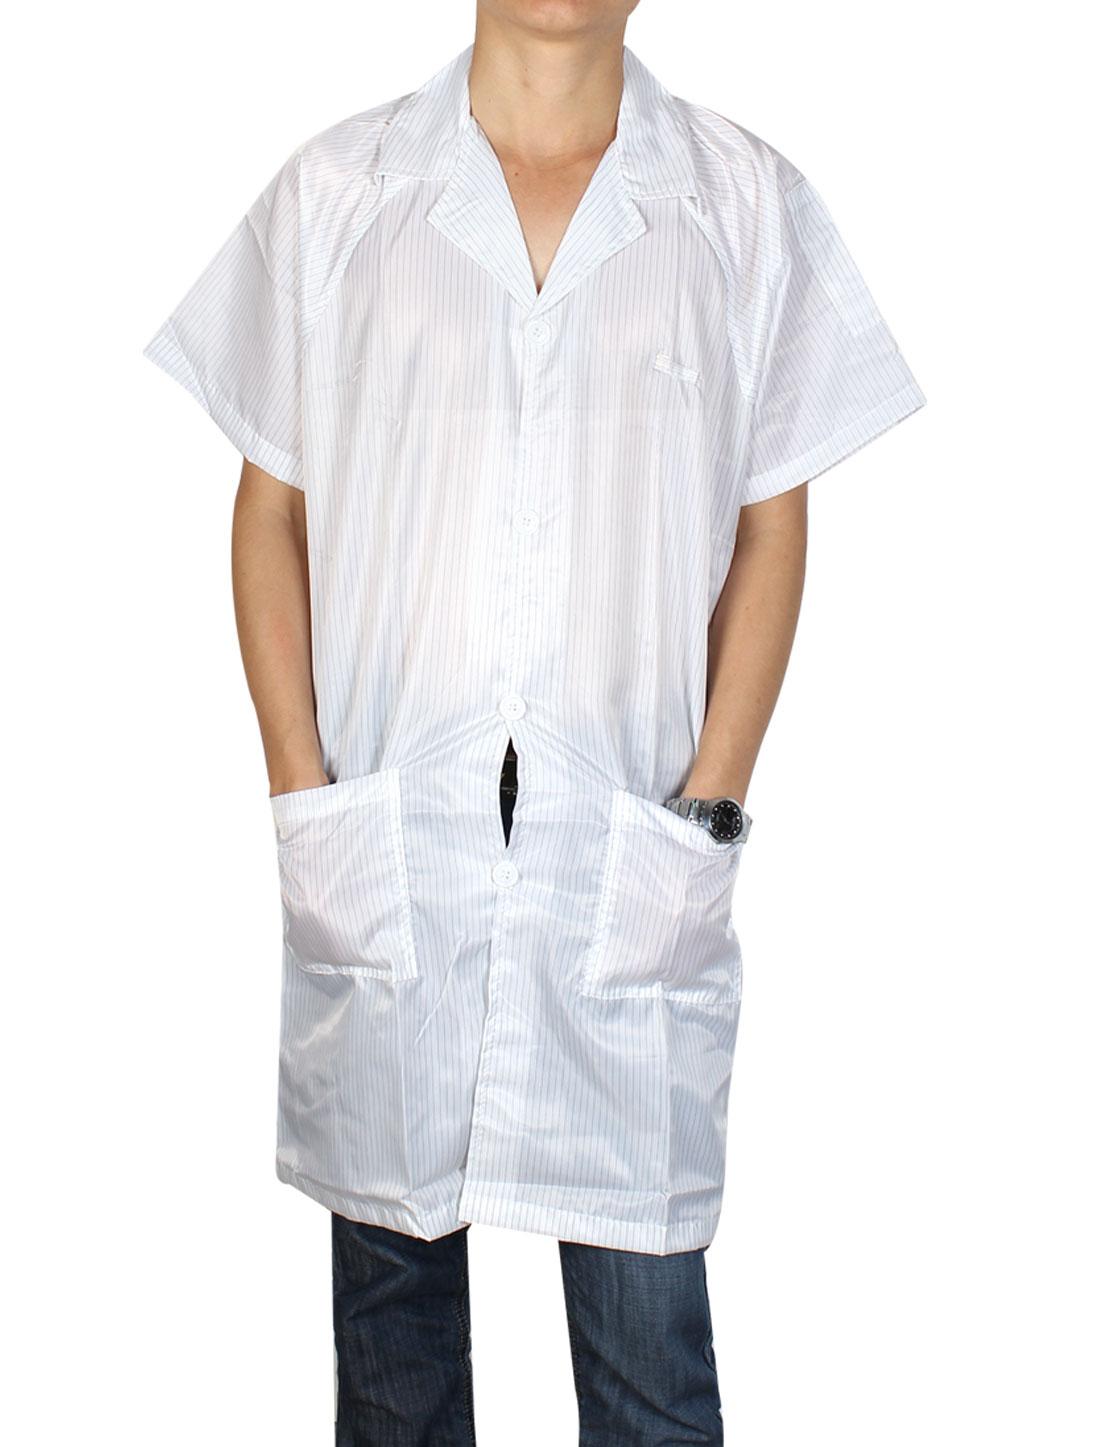 Women Men Lapel Collar Button Up ESD Lab Anti Static Overalls Coat Uniform White L